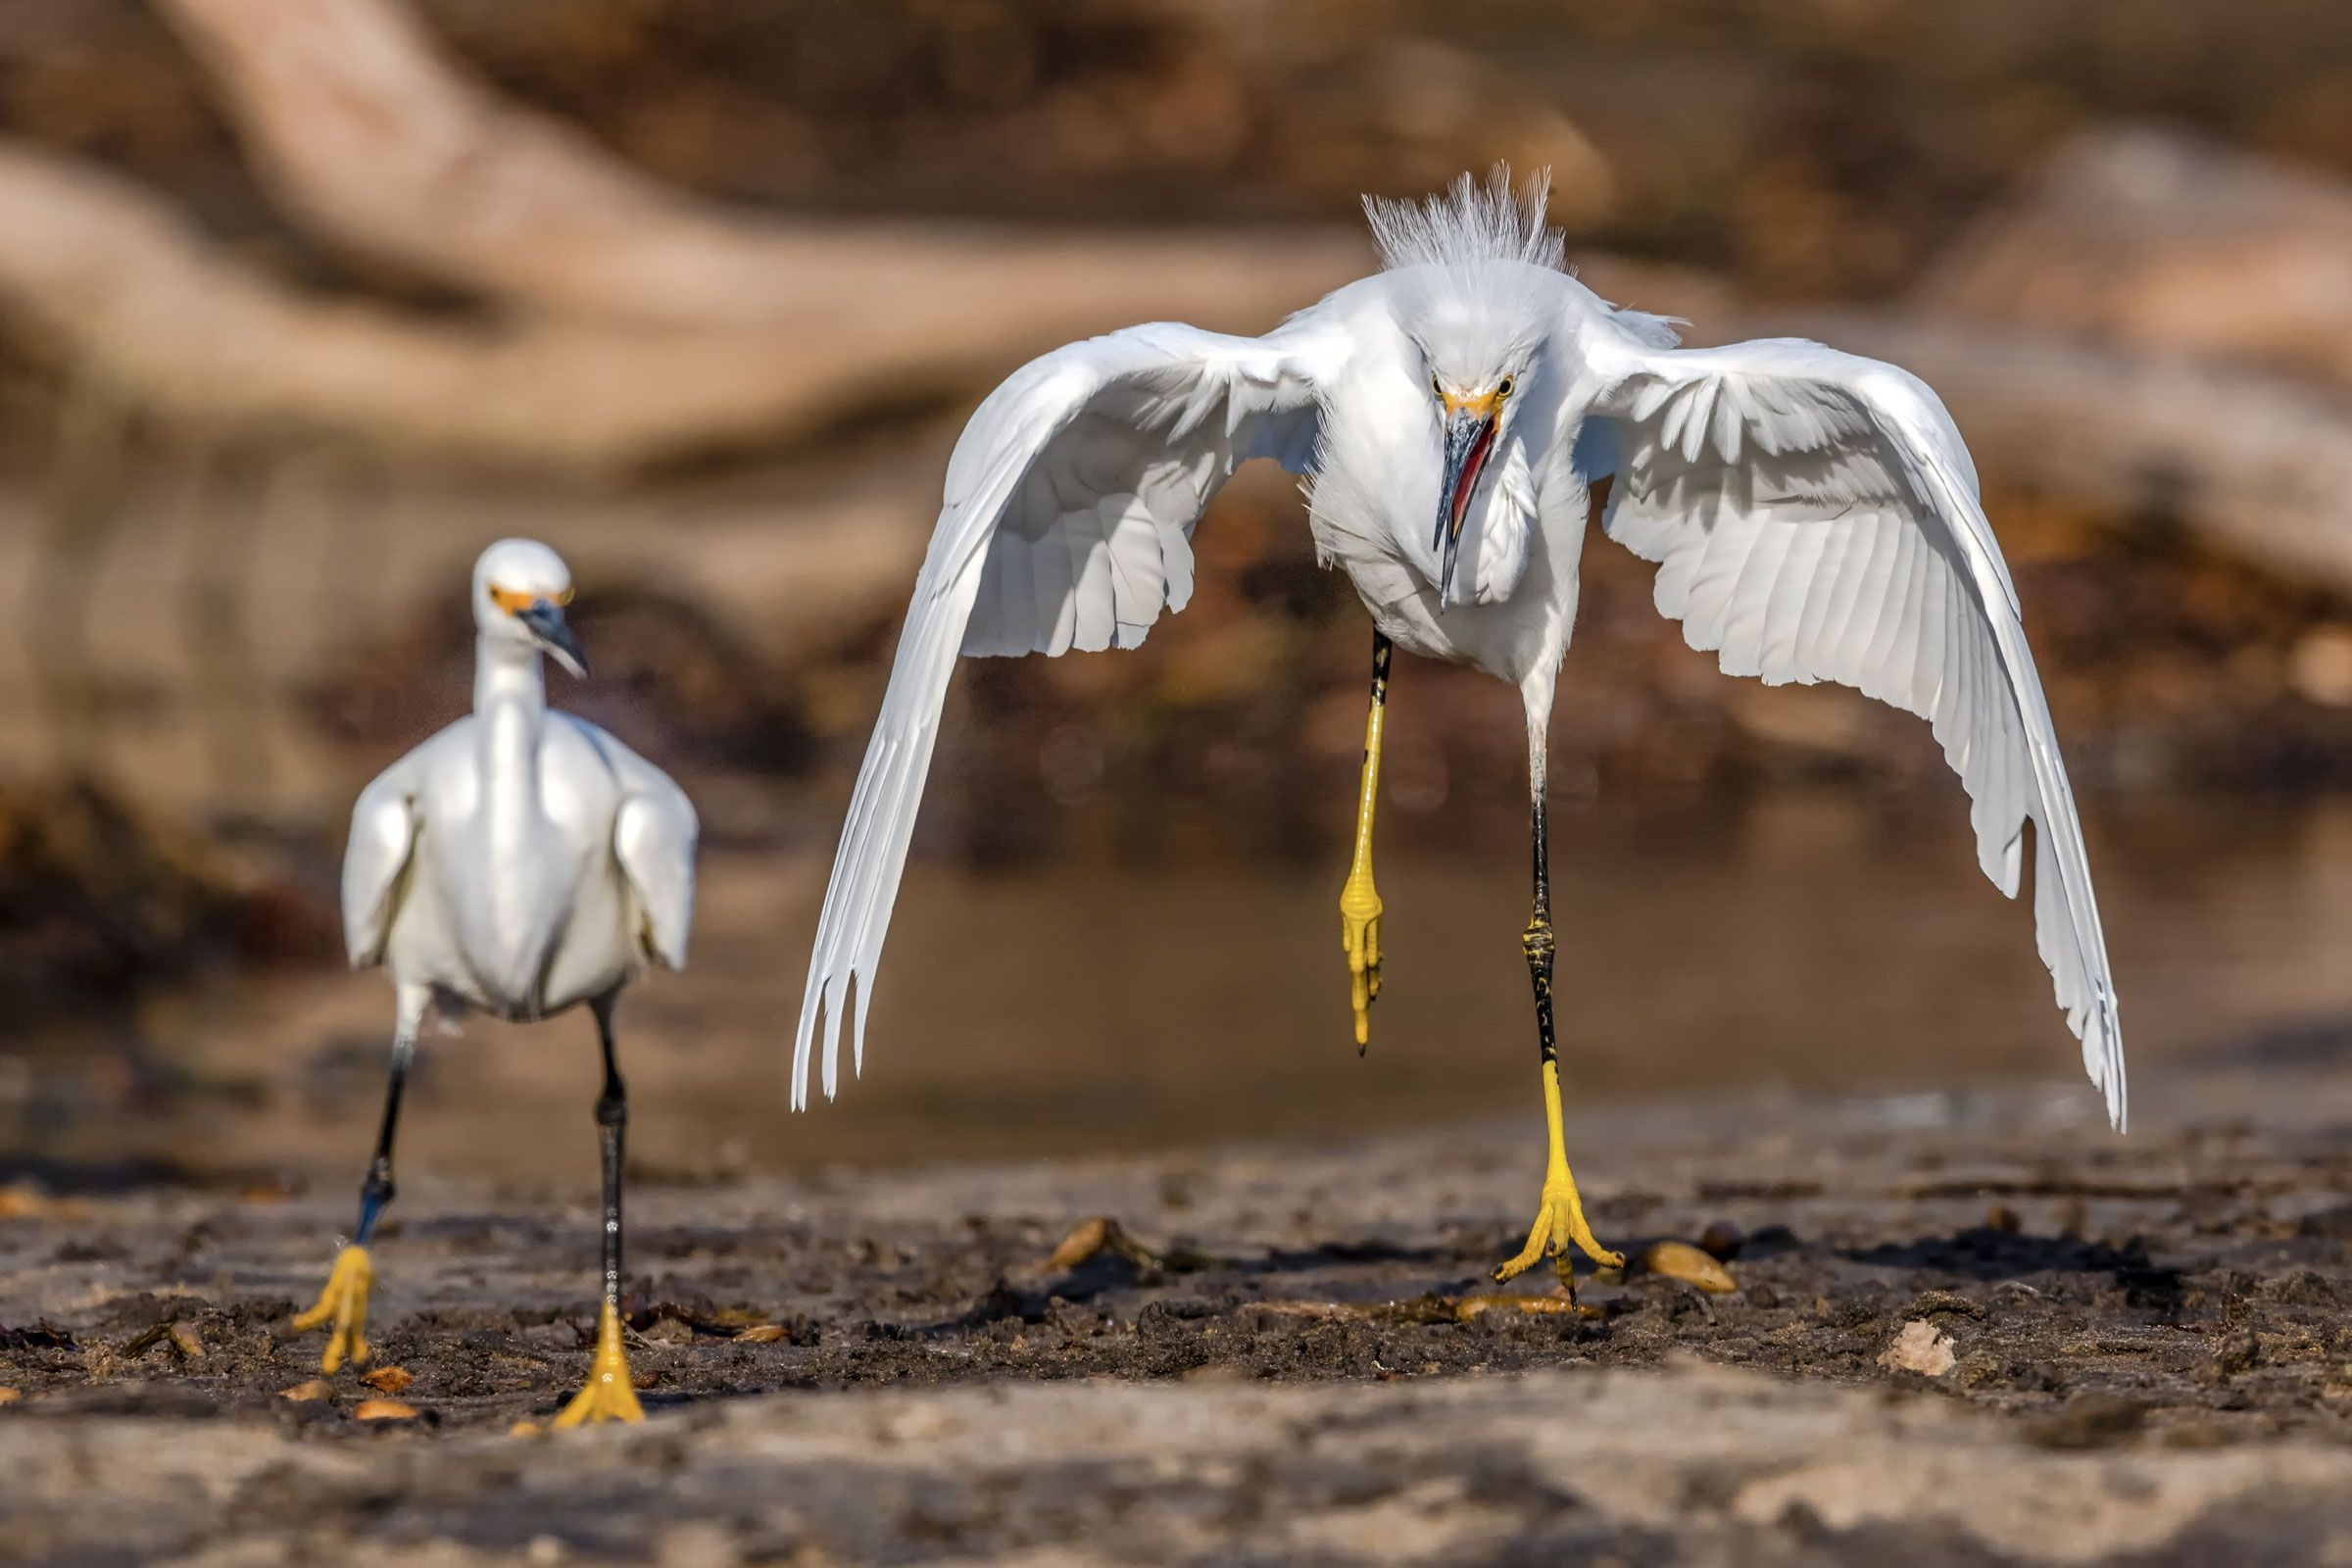 The 2019 Audubon Photography Awards: Top 100 -  The 2019 Audubon Photography Awards: Top 100 | Audubon  - #Audubon #Awards #fallskirtoutfits #Photography #photographyarticles #photographyawards #photographyessentials #photographyfilters #Top #wildlifephotography